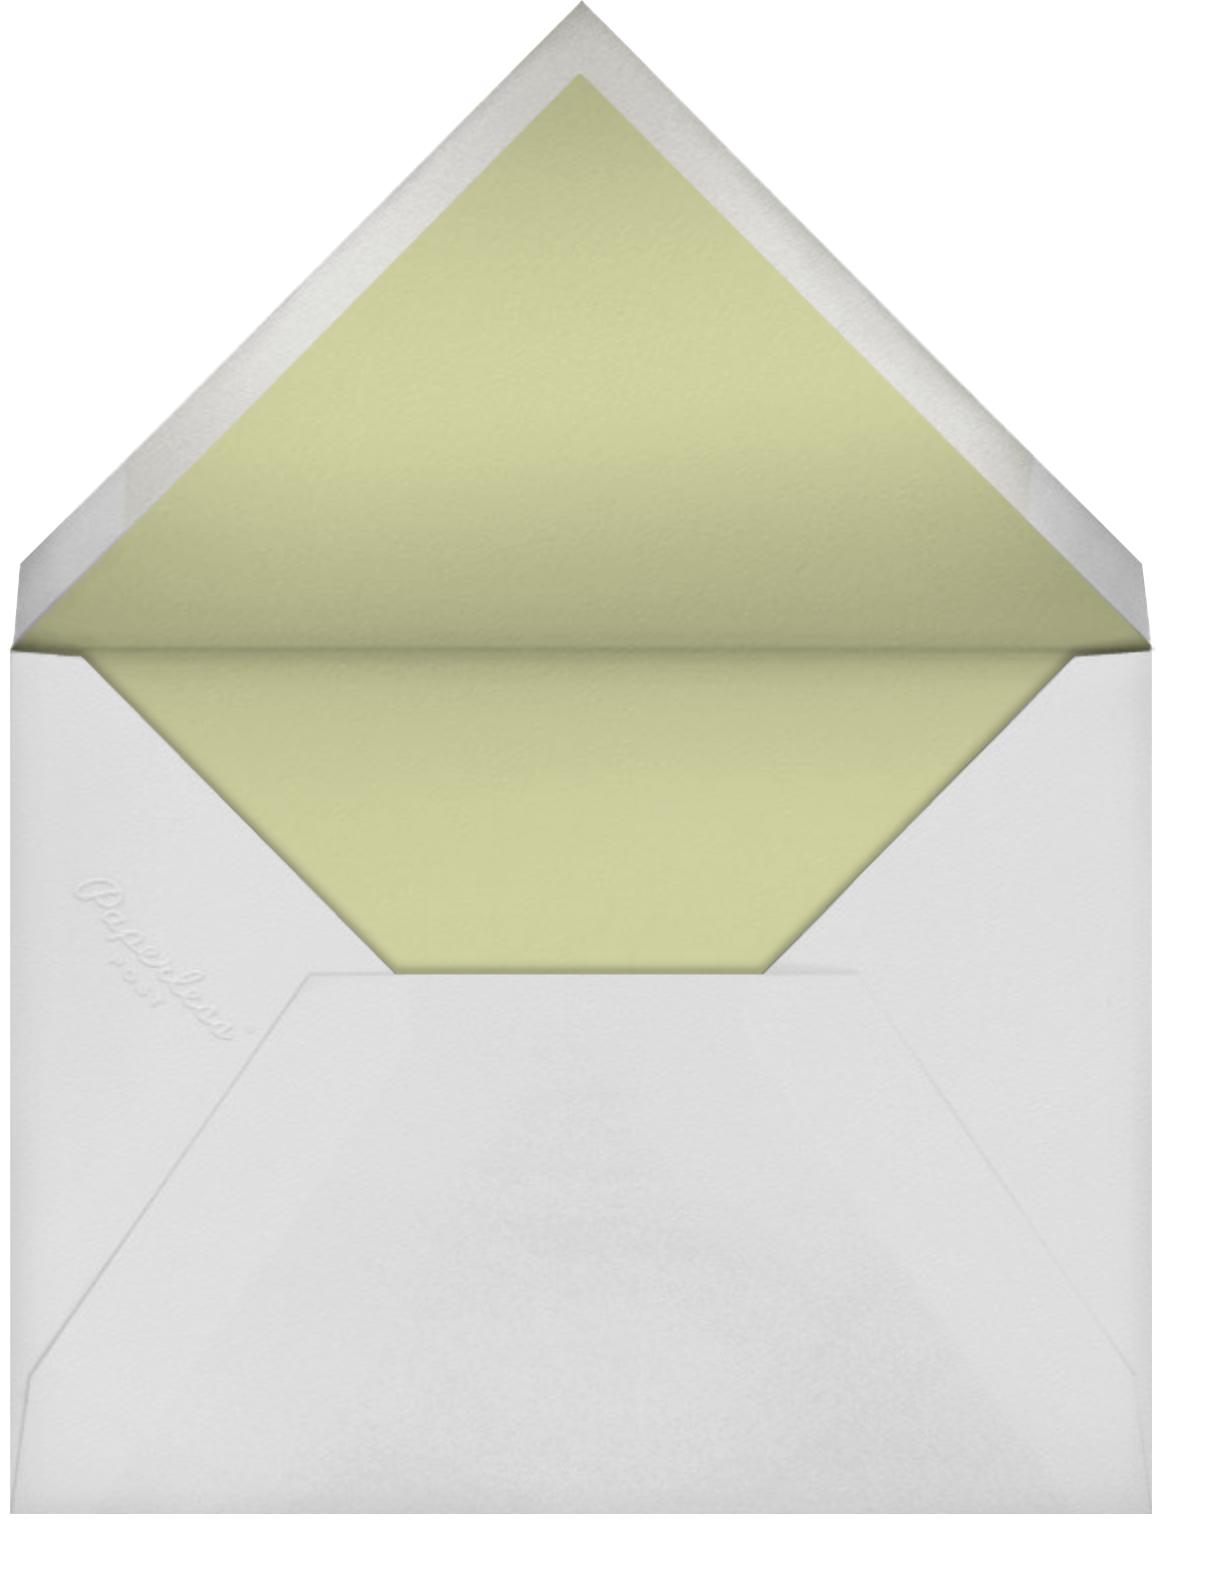 Palmier I - Celery - Paperless Post - All - envelope back